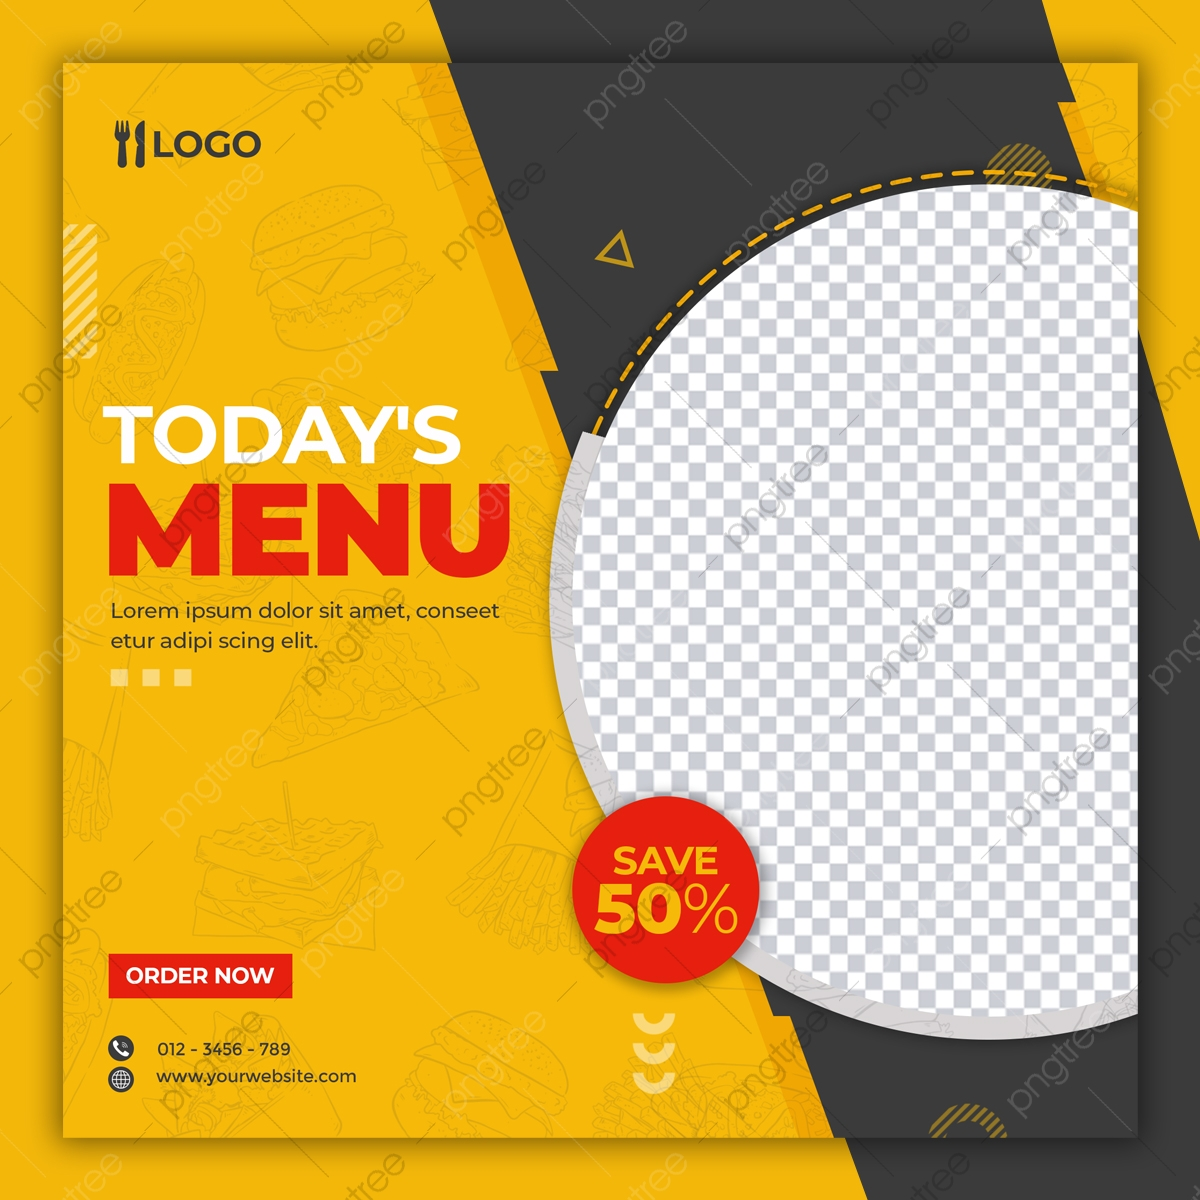 Restaurant Food Instagram Social Media Post Design Template Template For Free Download On Pngtree